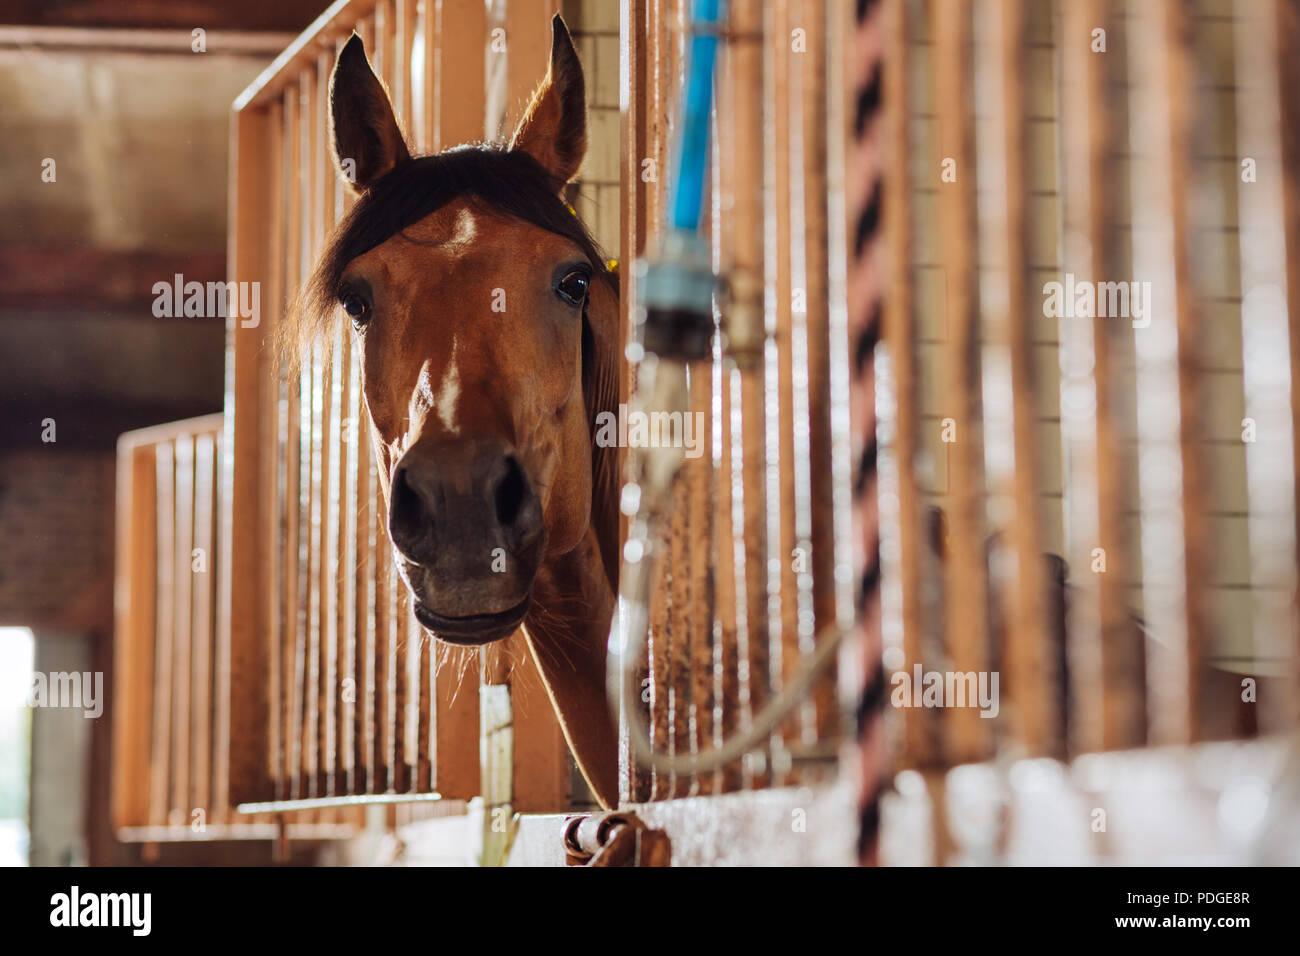 Sanfte schöne Racing Pferd stehend in berühmten geräumige stabil Stockbild